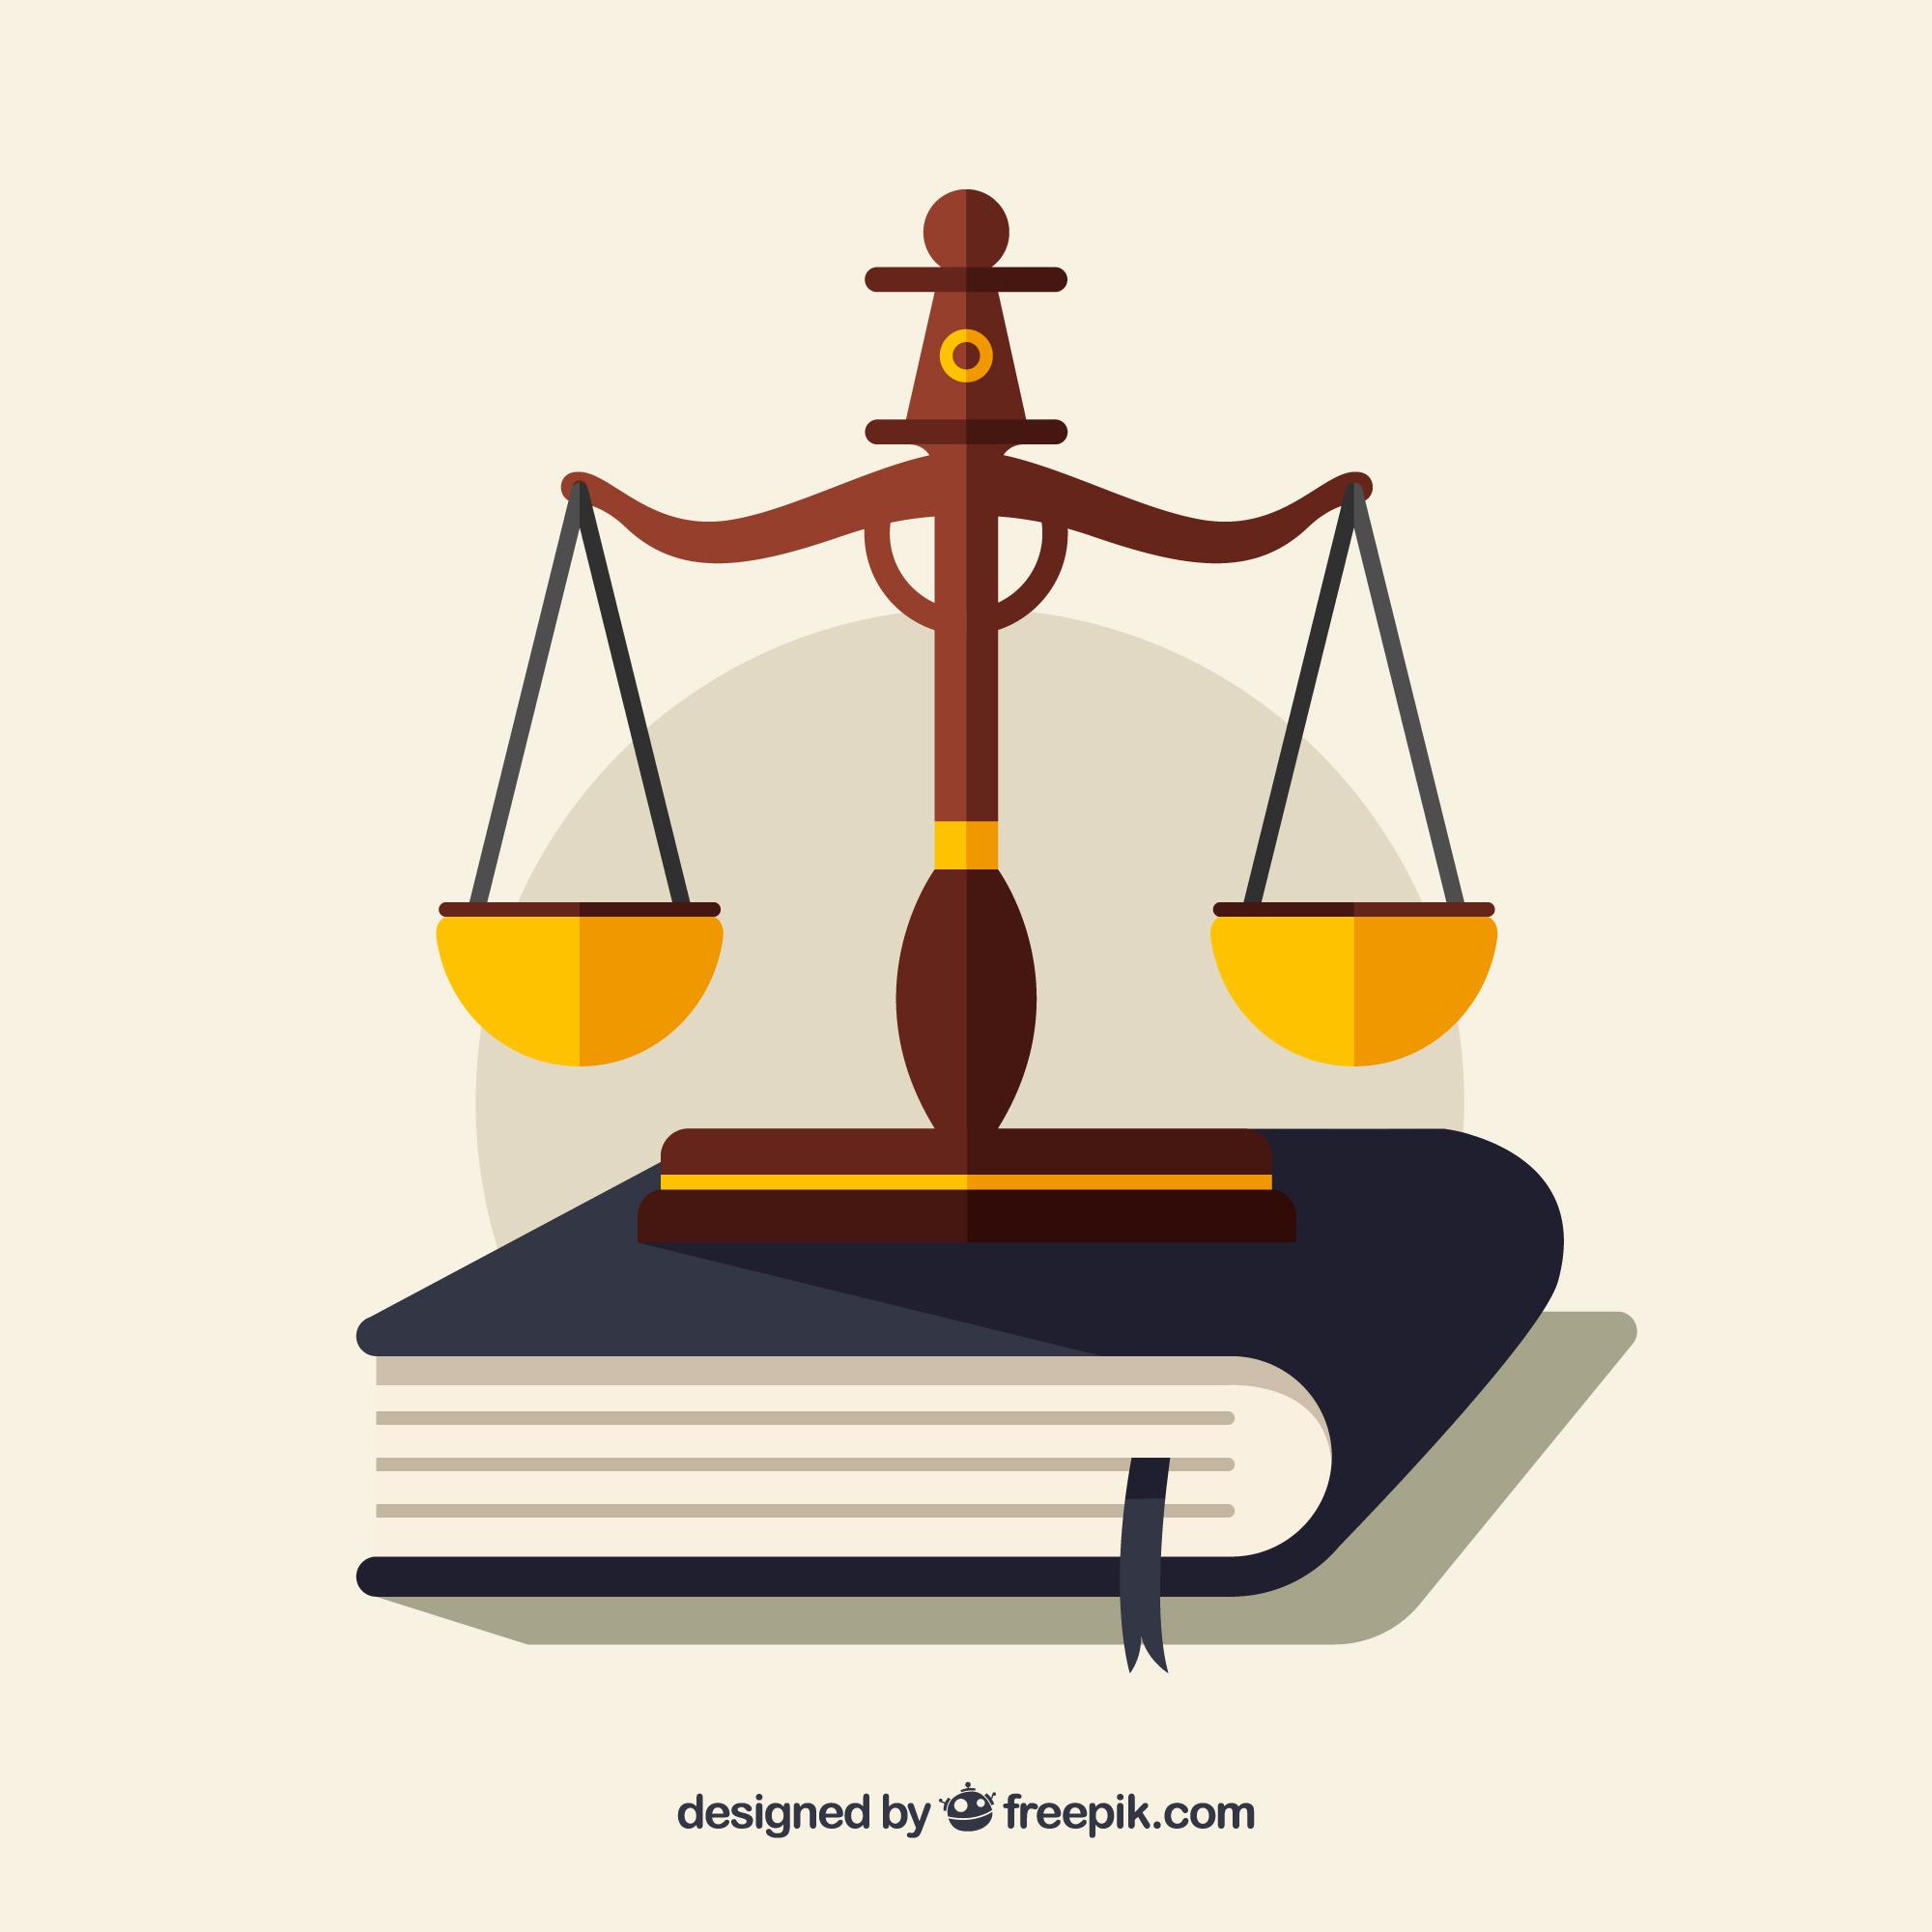 Belajar Apa Aja sih di Jurusan Ilmu Hukum? 9